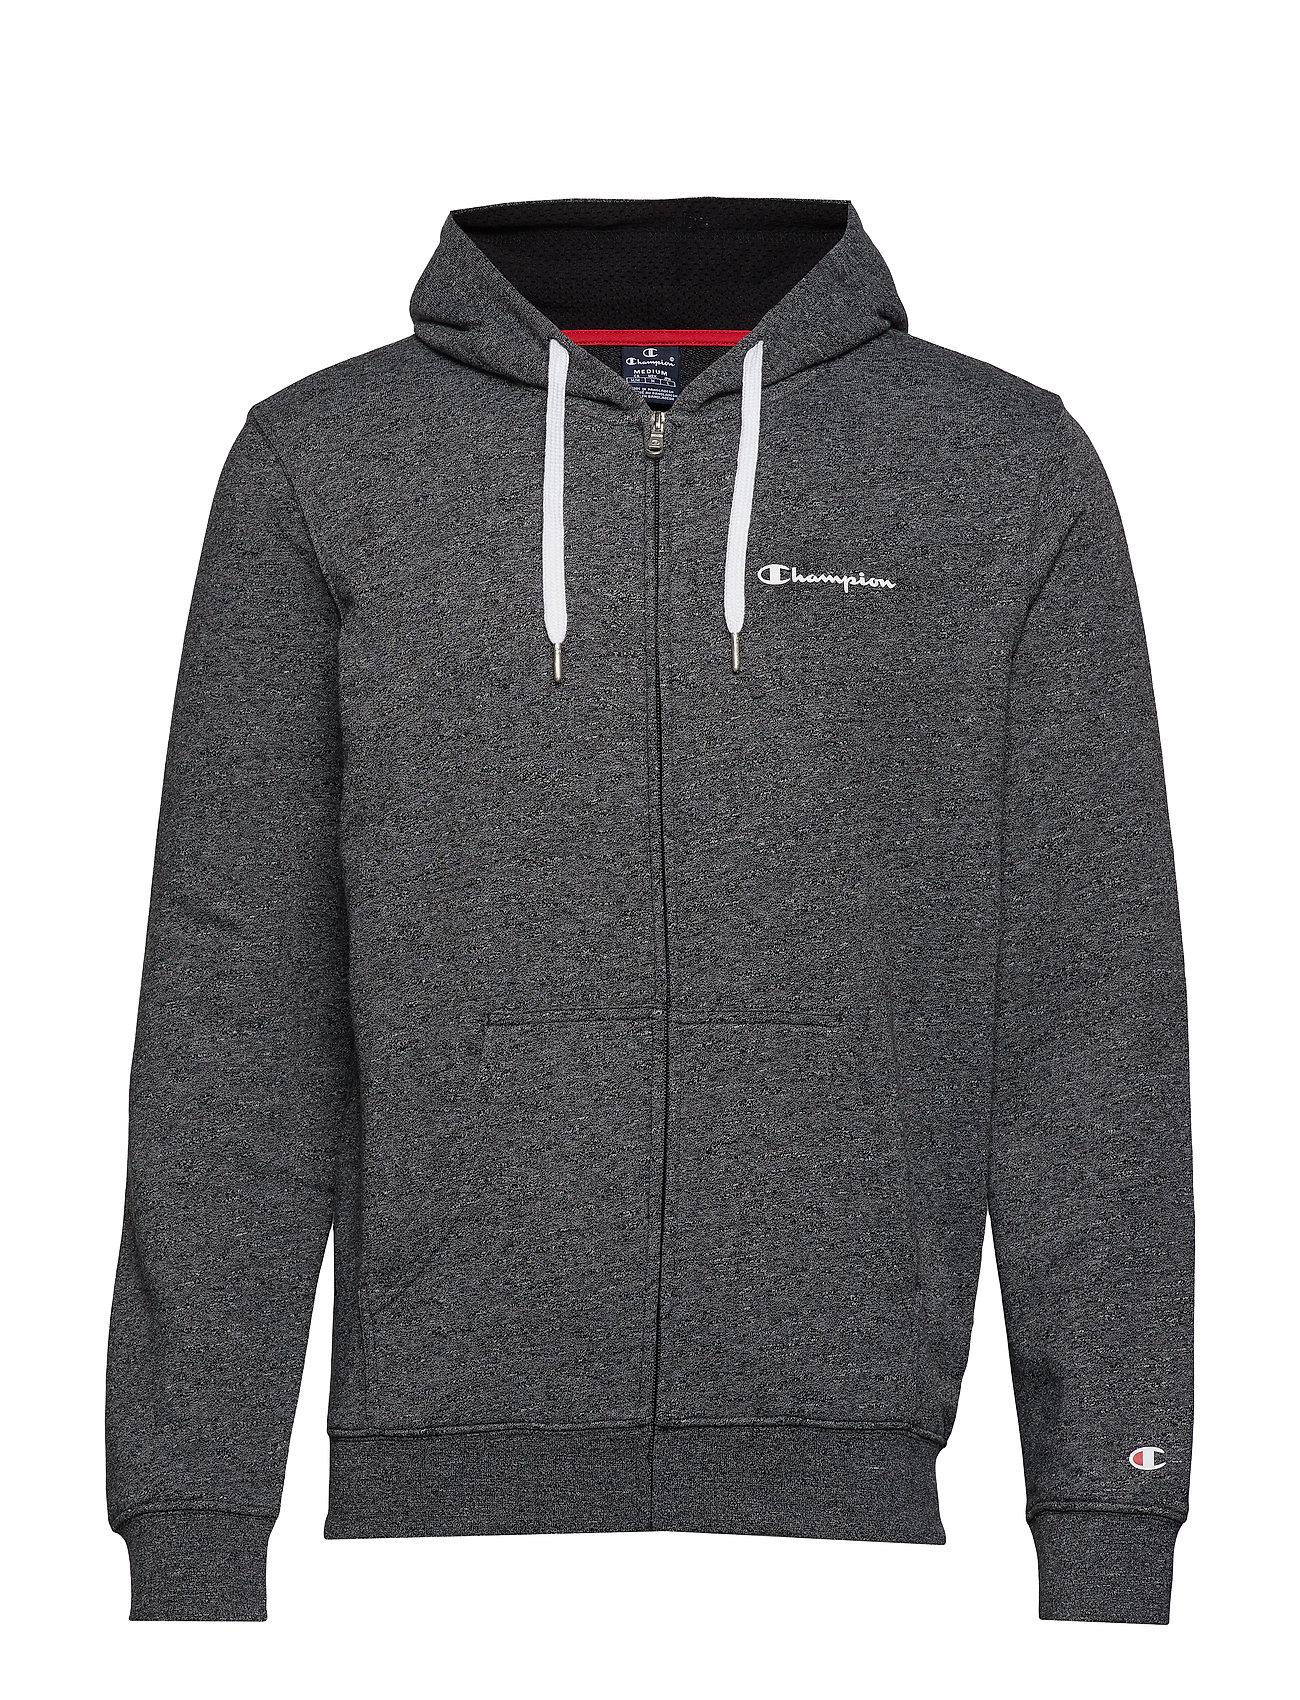 Champion Hooded Full Zip Sweatshirt - WHITE BLACK JASPE MELANGE